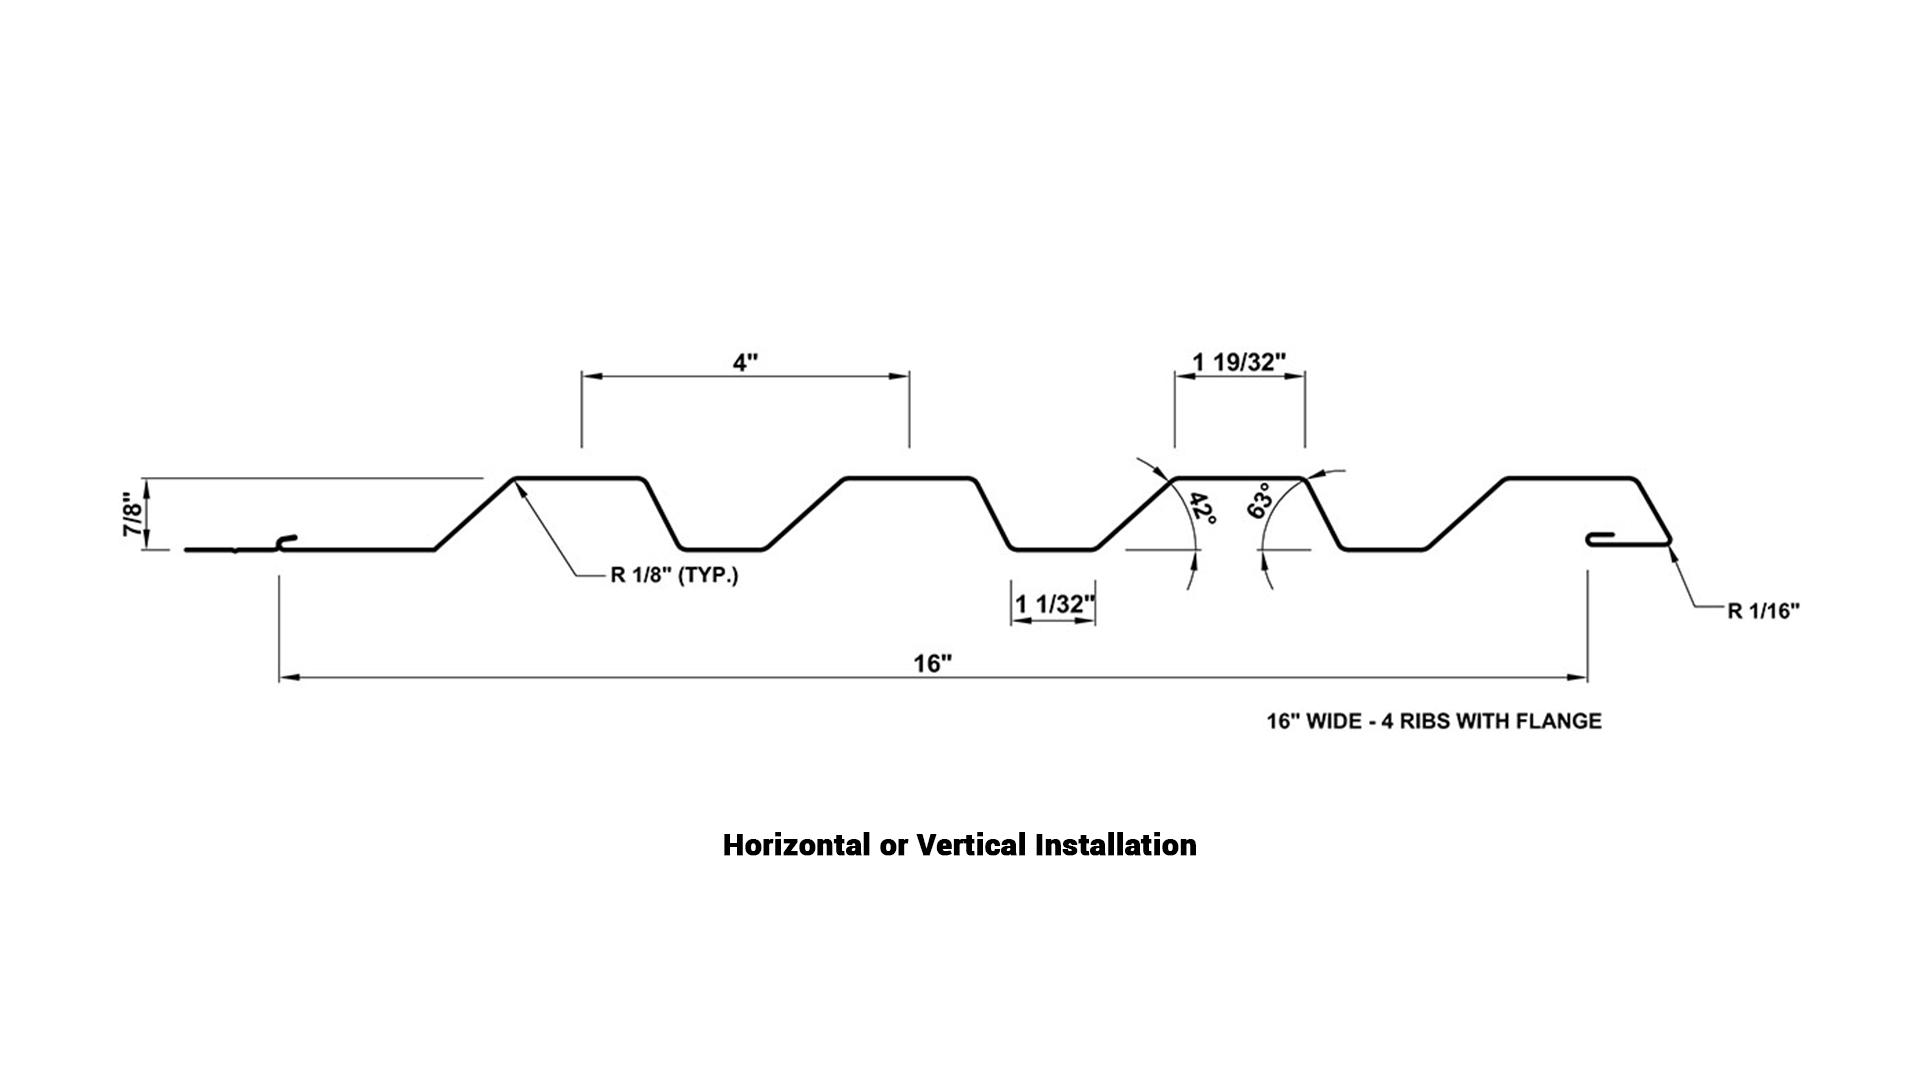 https://f.hubspotusercontent30.net/hubfs/6069238/images/line-drawings/western-wave-line-drawing.jpg